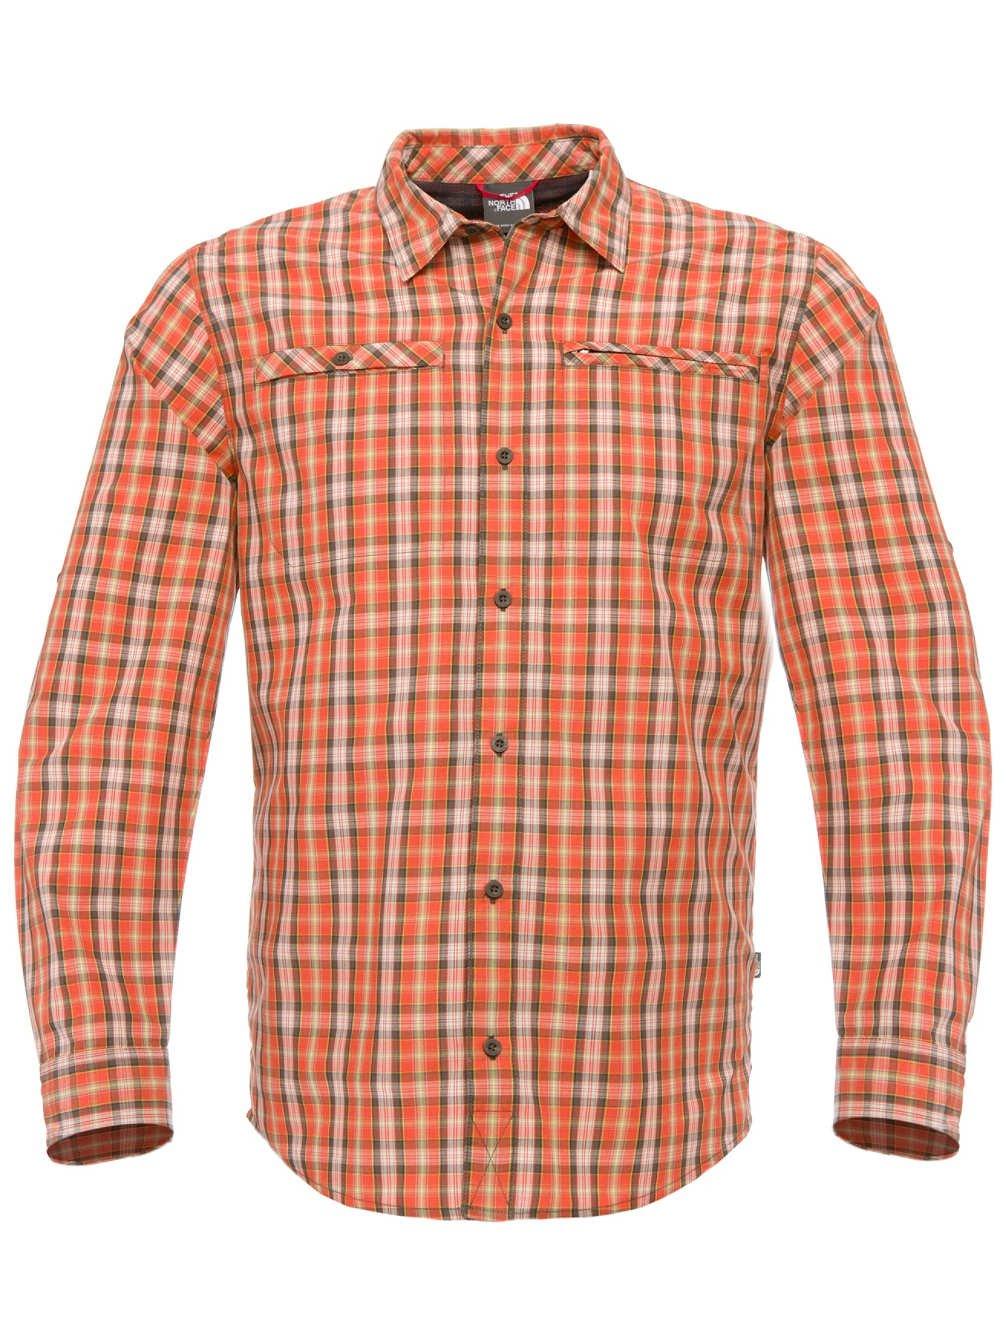 THE NORTH FACE L/S Gator Shirt Orange